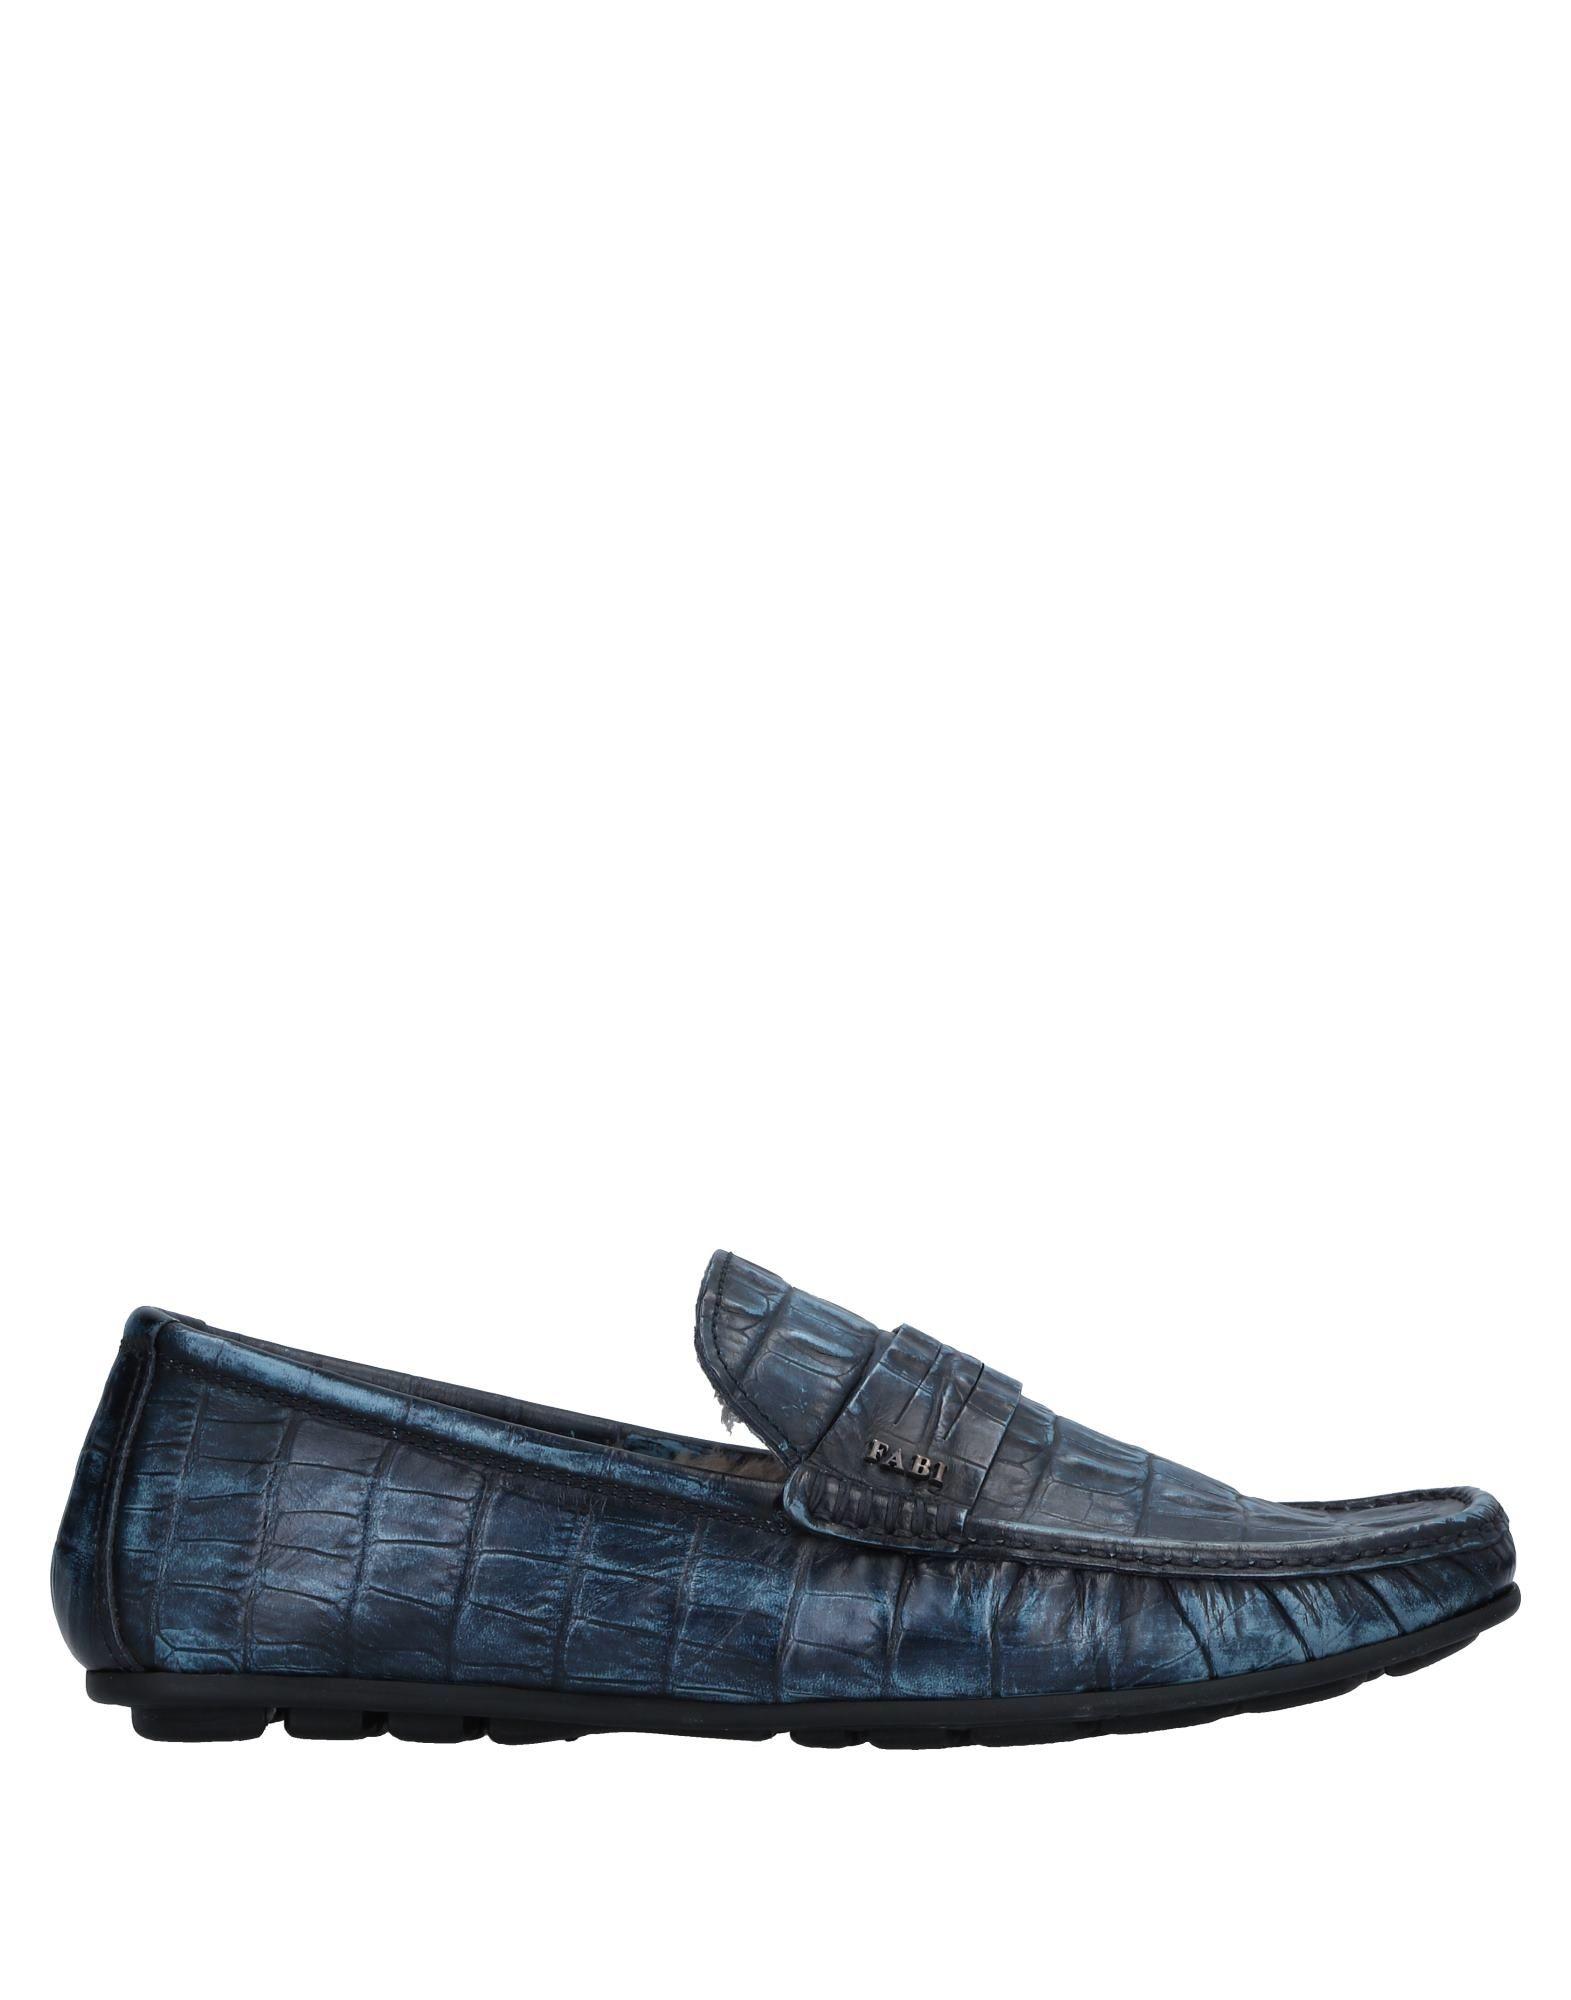 Fabi Mokassins Herren  11534367HM Gute Qualität beliebte Schuhe